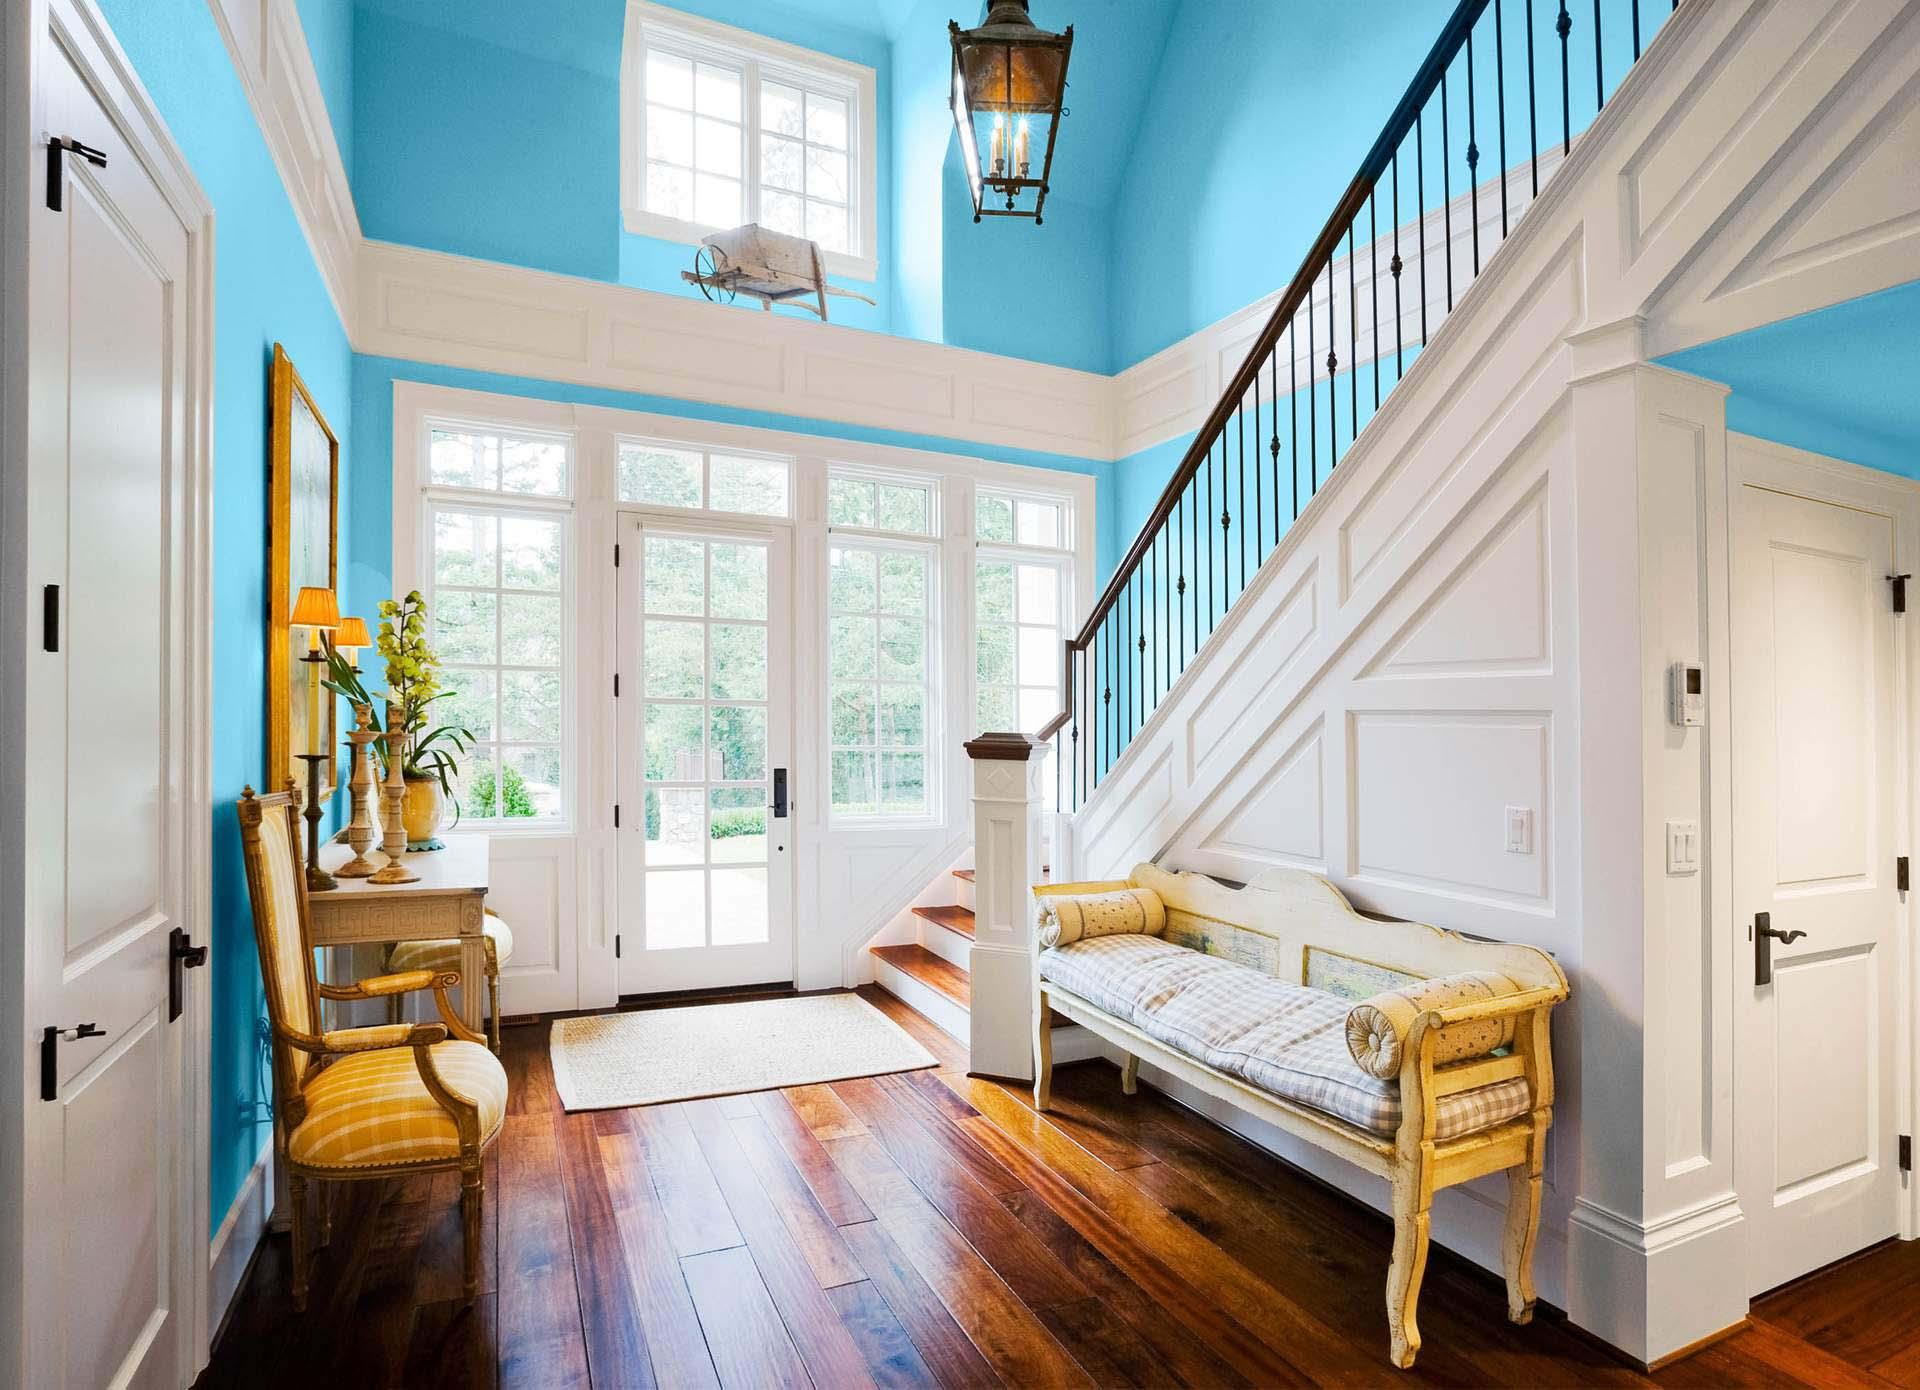 California Real Estate Agent Rankings Homelight # Muebles Kesia Ferrol